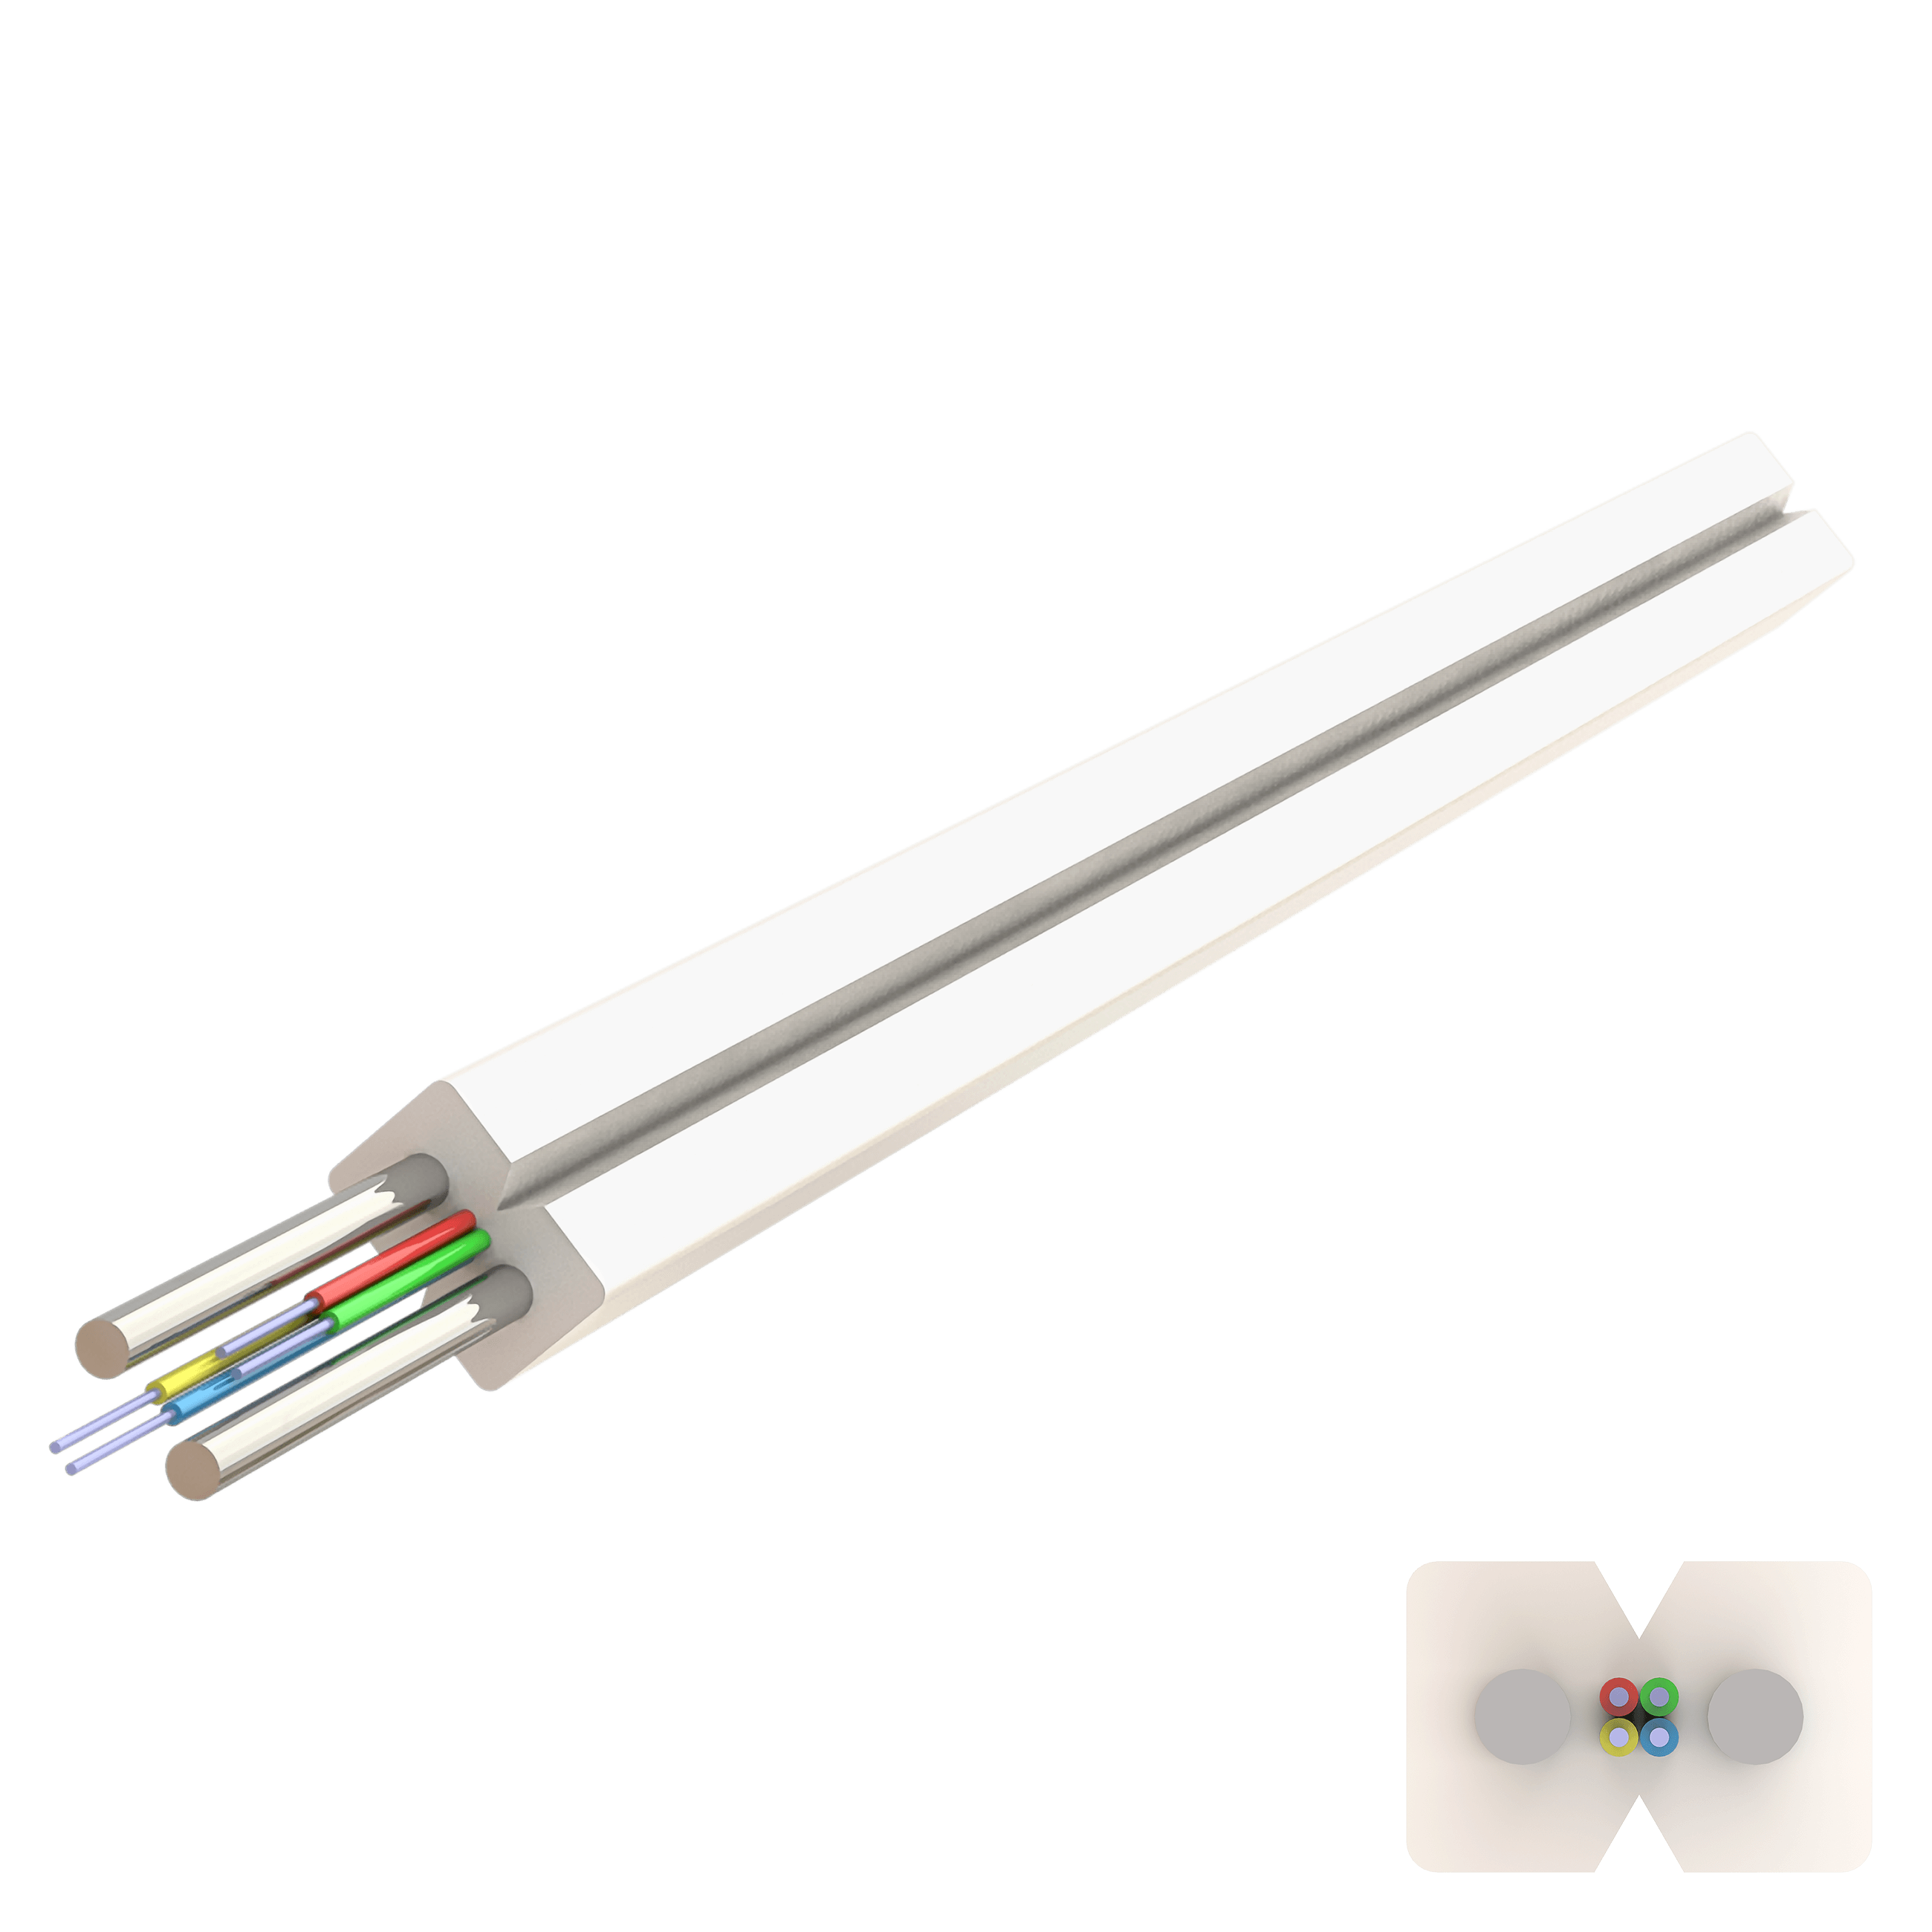 Samm Teknoloji - Flat Drop Çelik Kablo 2.0x3.0mm | U-N(ZM)H | Up to 4F | 1000 metre (1)